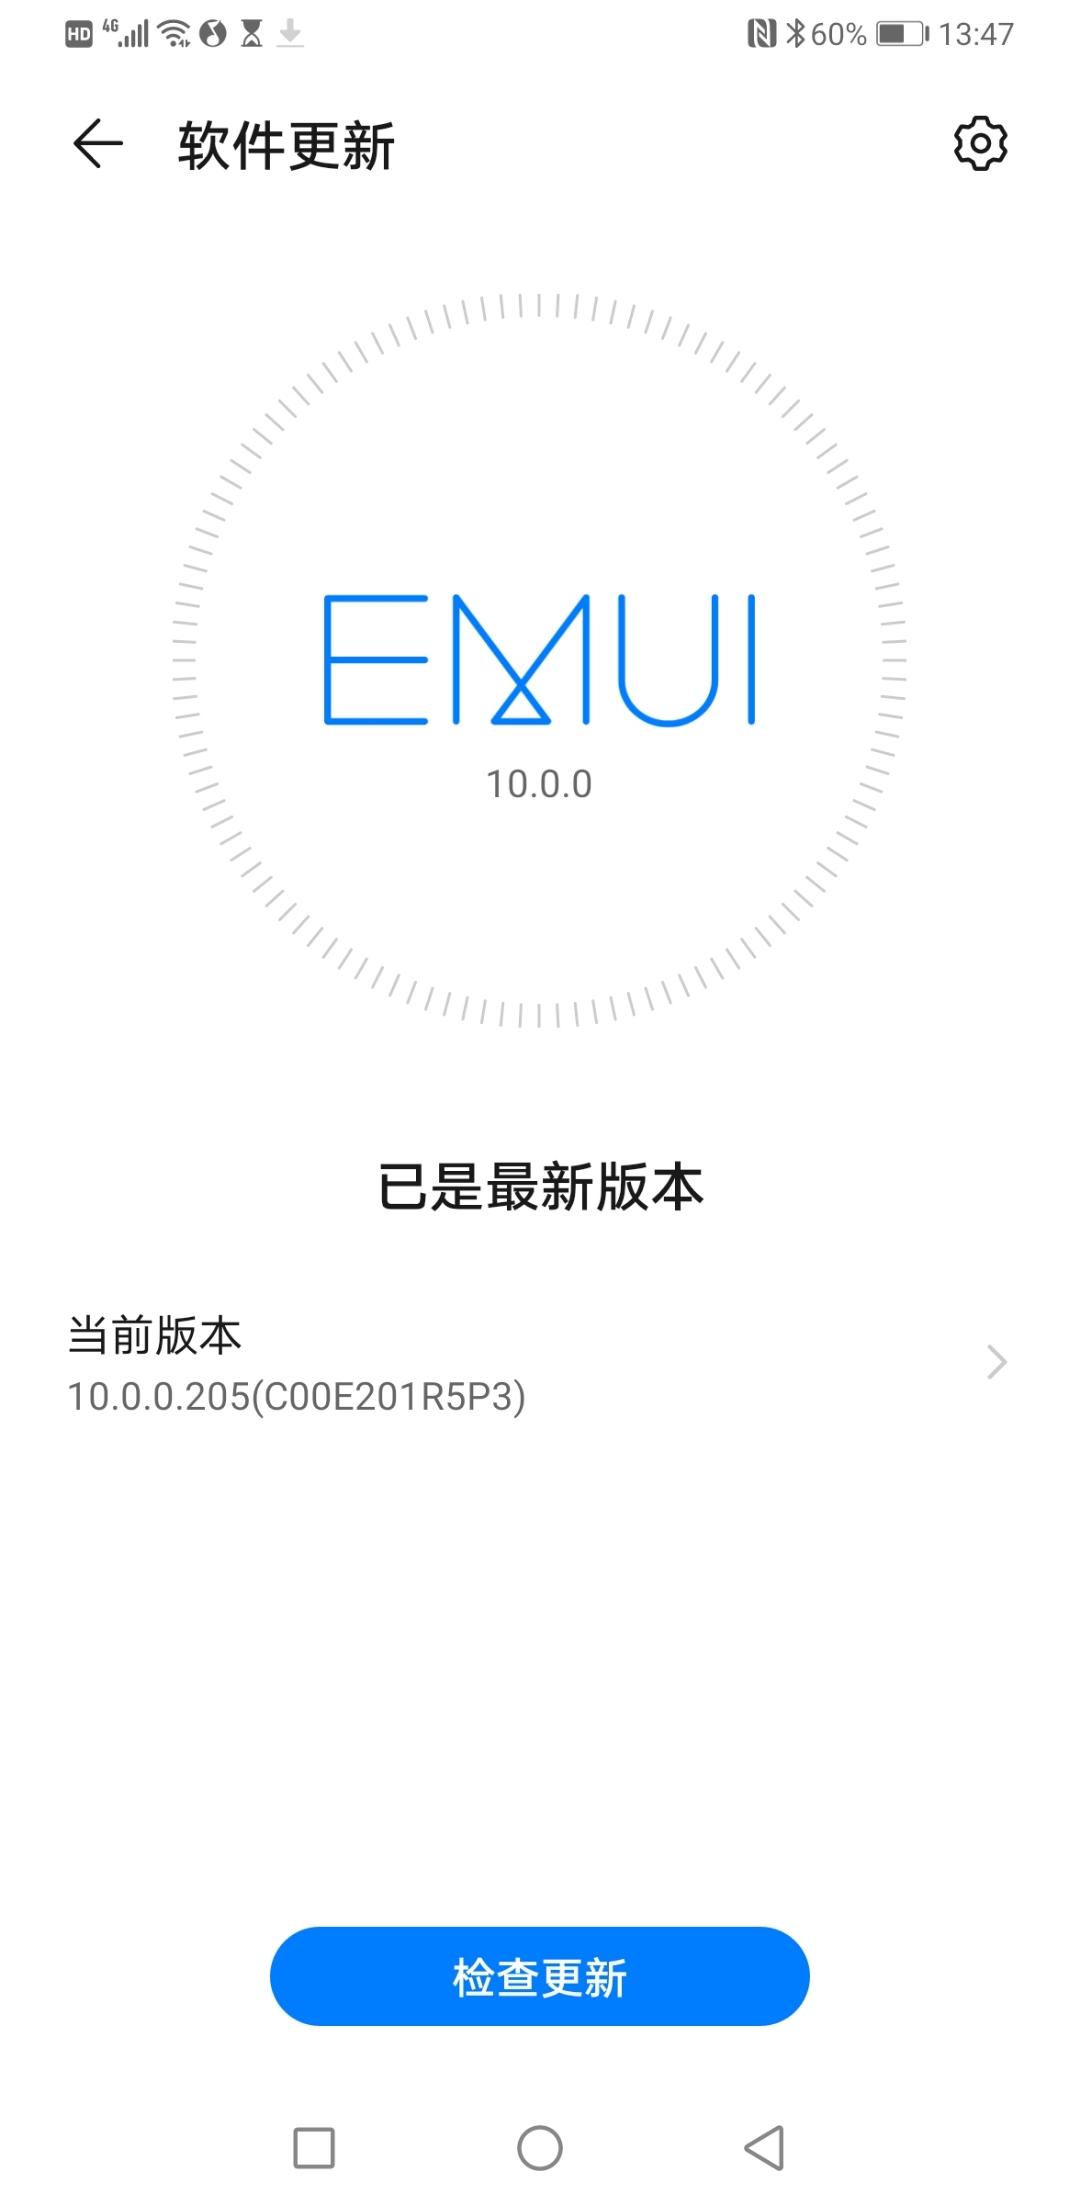 Screenshot_20200507_134736_com.huawei.android.hwouc.jpg